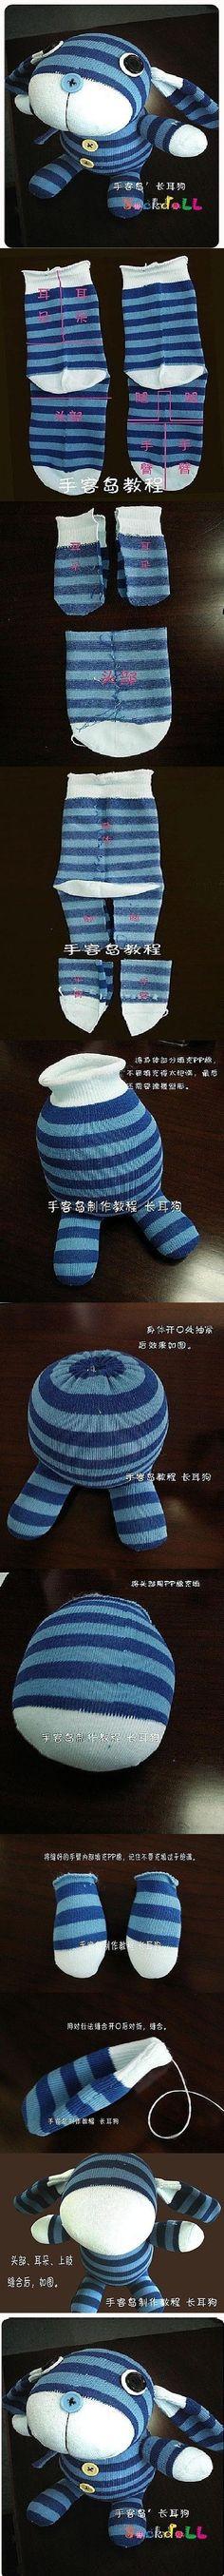 DIY Fantasy Sock Doll DIY Fantasy Sock Doll by diyforever